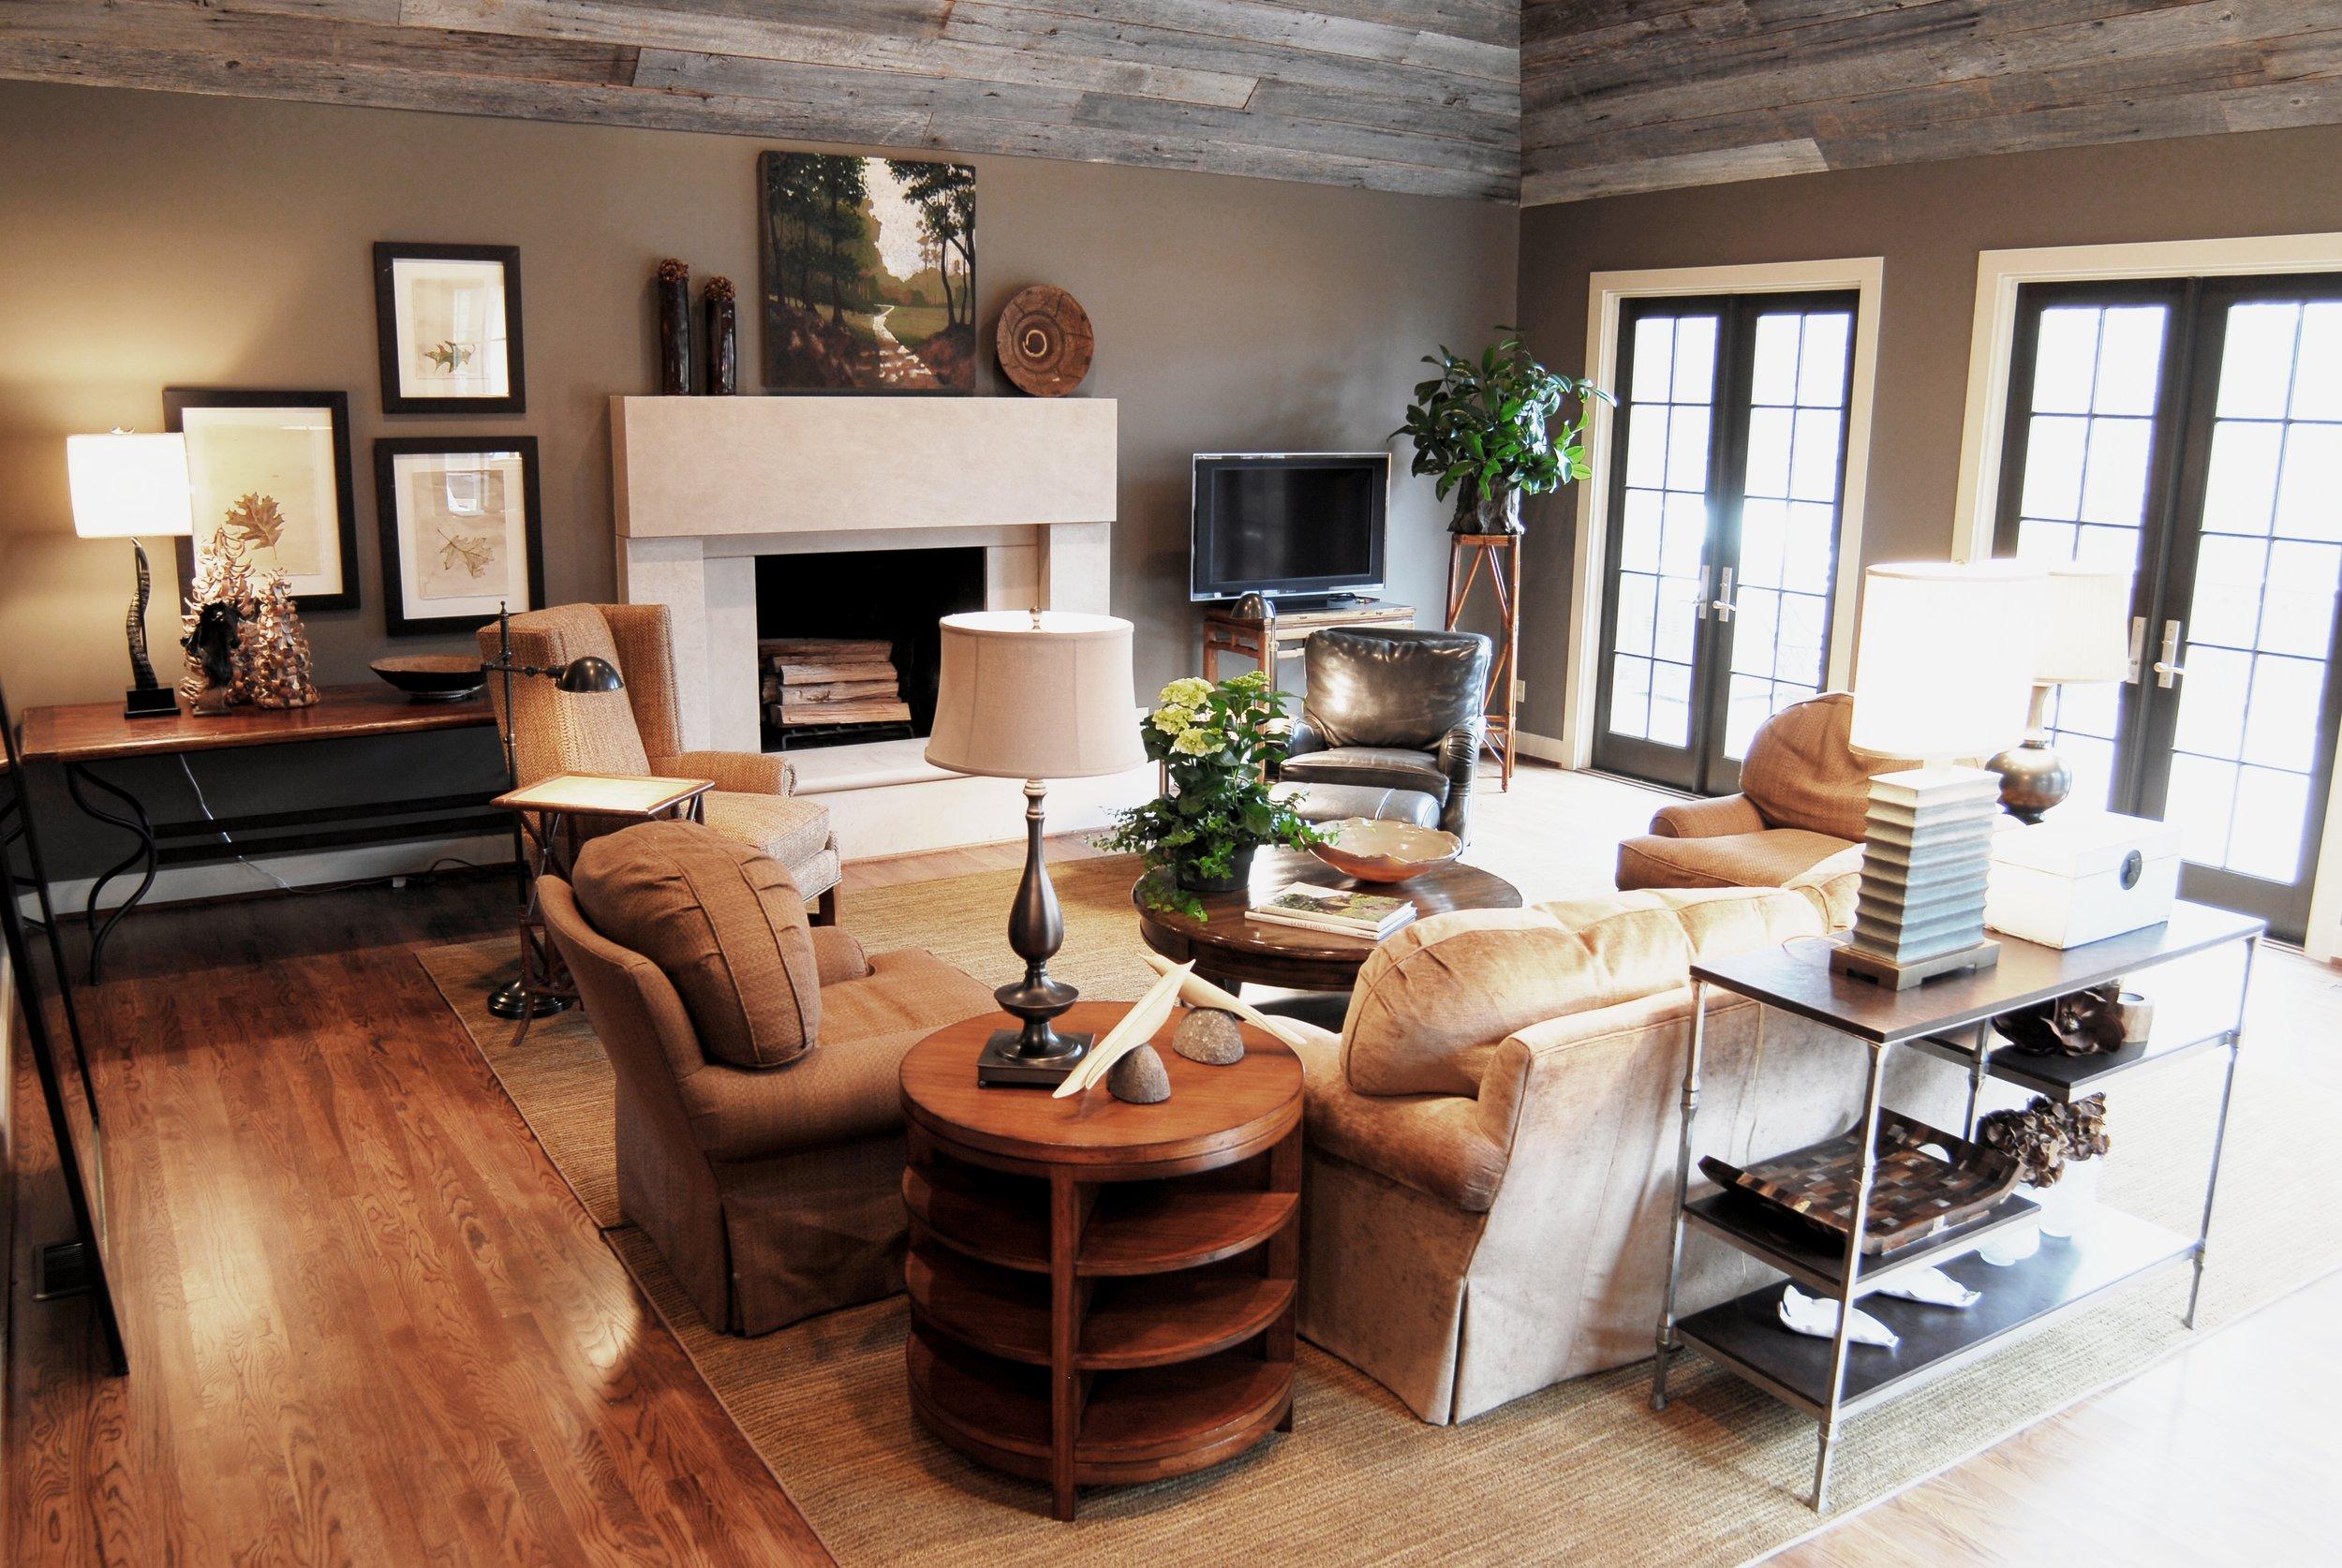 Birmingham Magazine Taking it down a notch highlight interior design Alabama